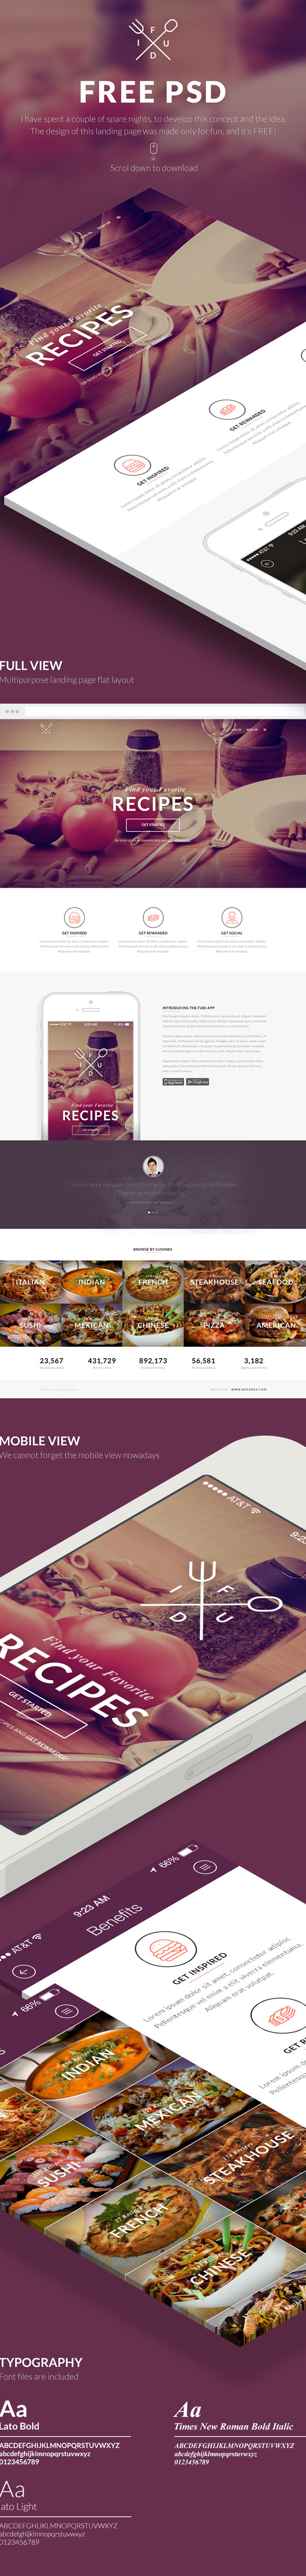 free free psd download flat Multipurpose Theme landing page restaurant Food  recipe mobile respnsive iphone logo